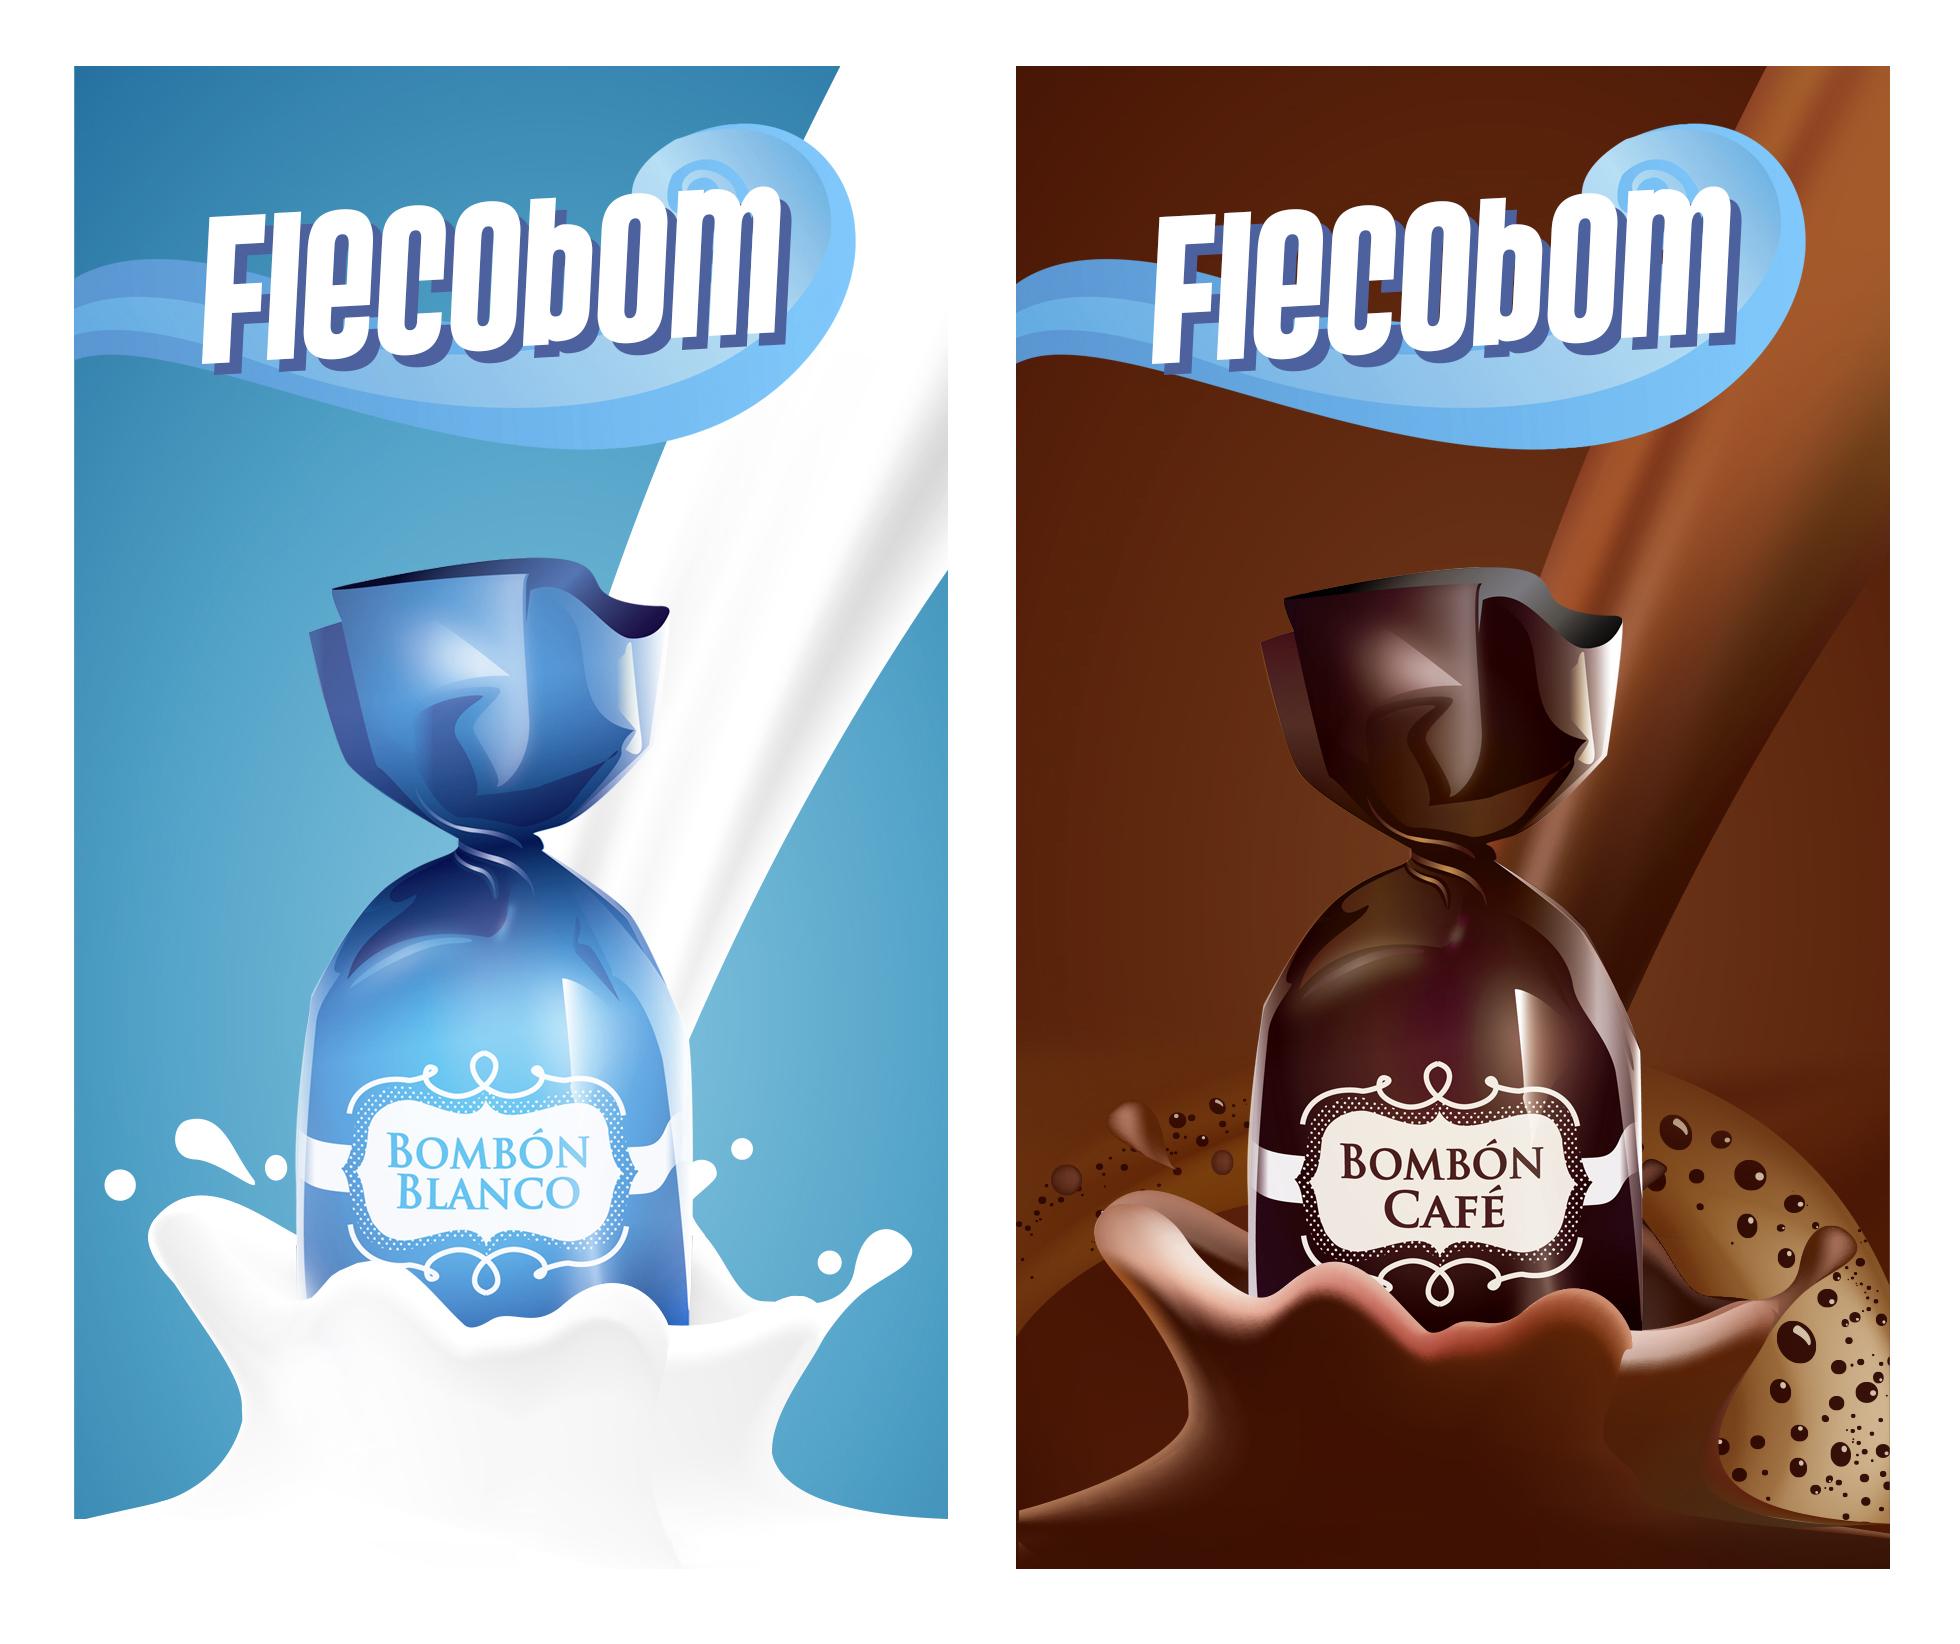 flecoboms